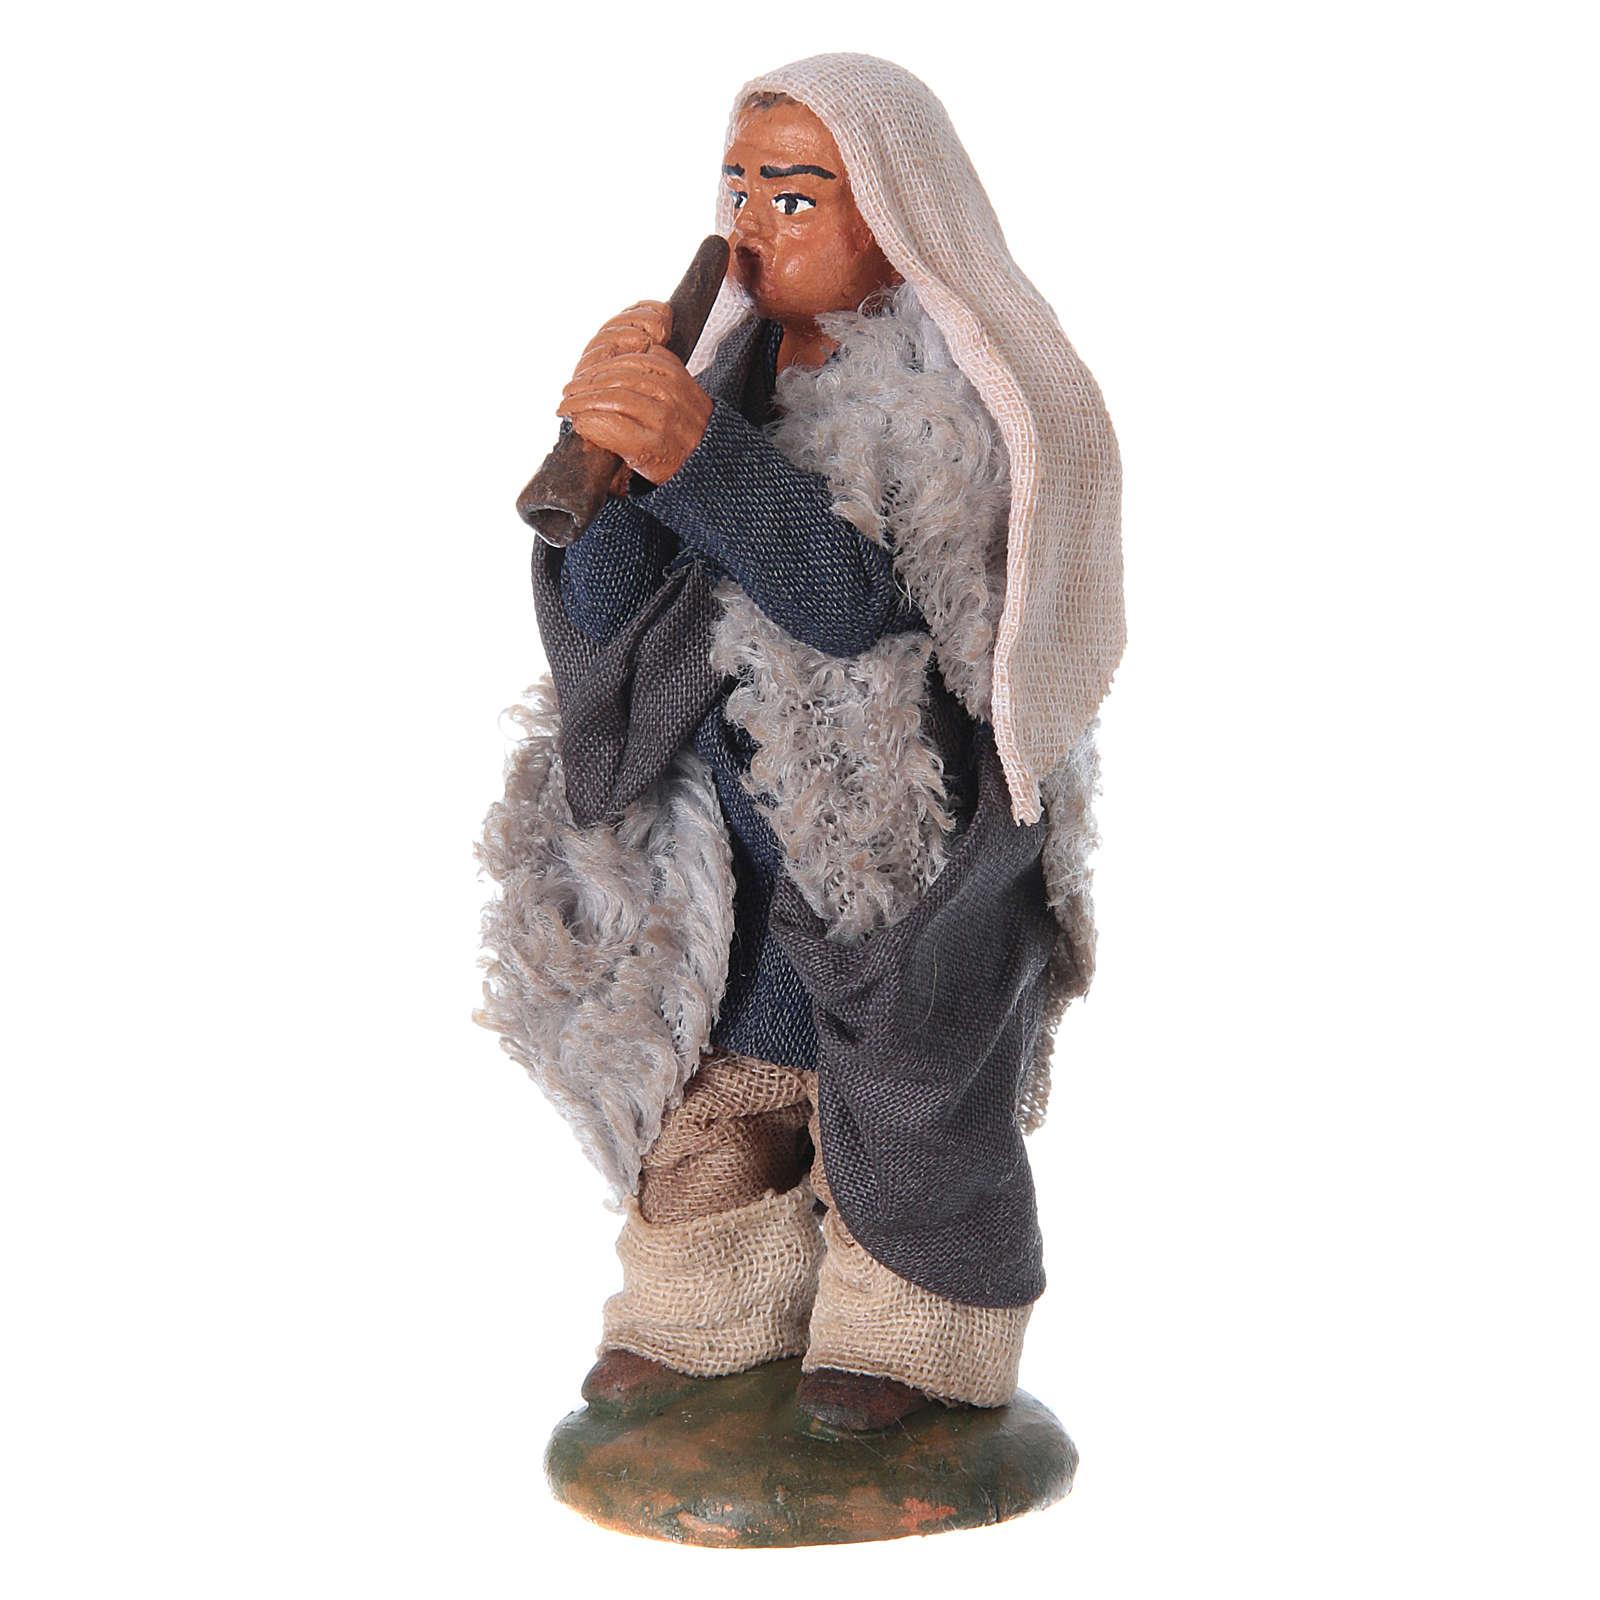 Nativity set accessory fifer 10 cm clay figurine 4